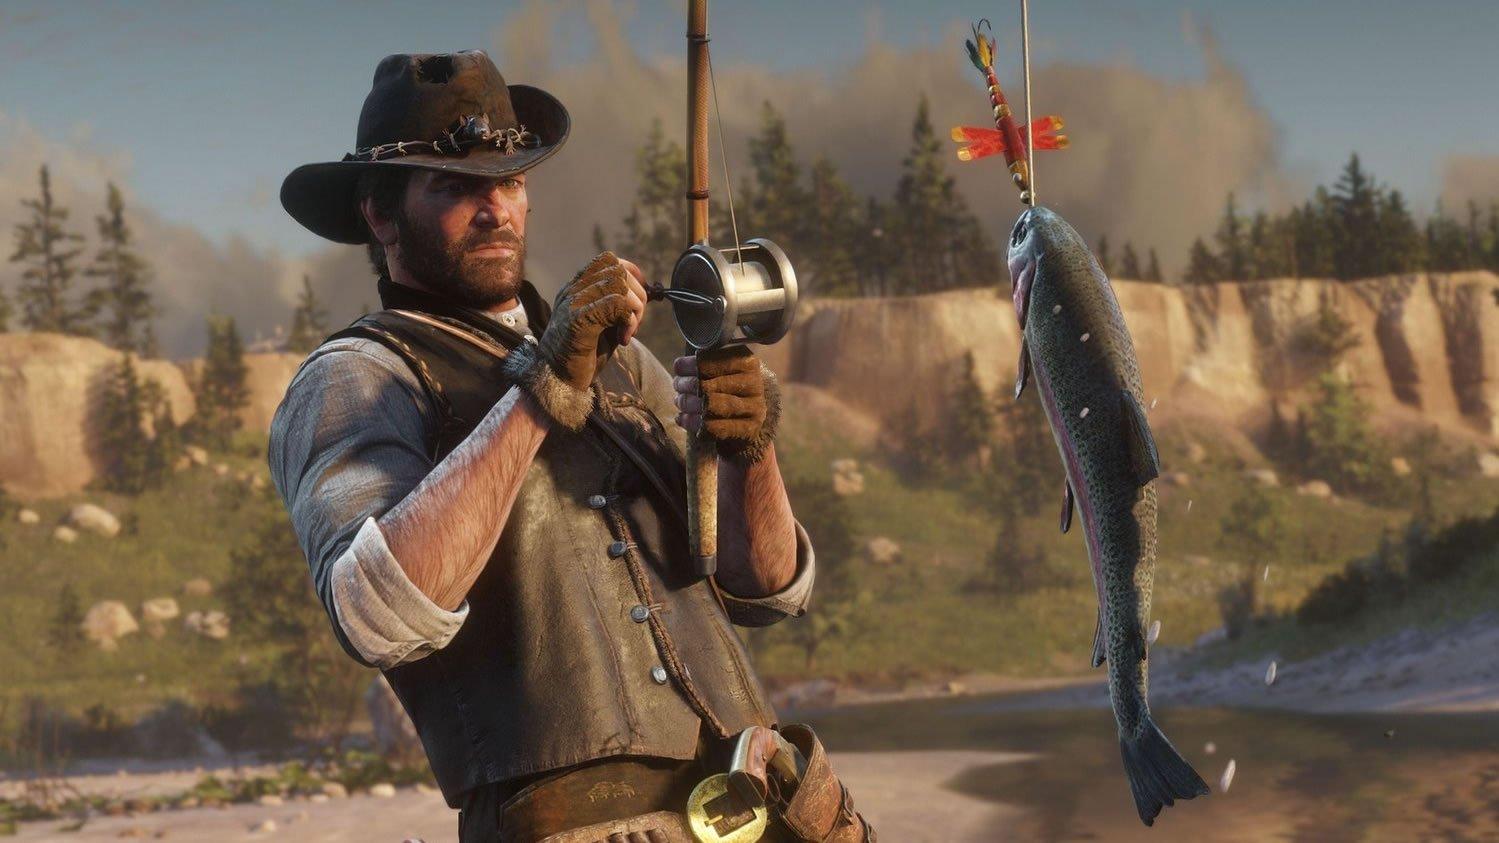 Catch a few fish, make a few bucks.